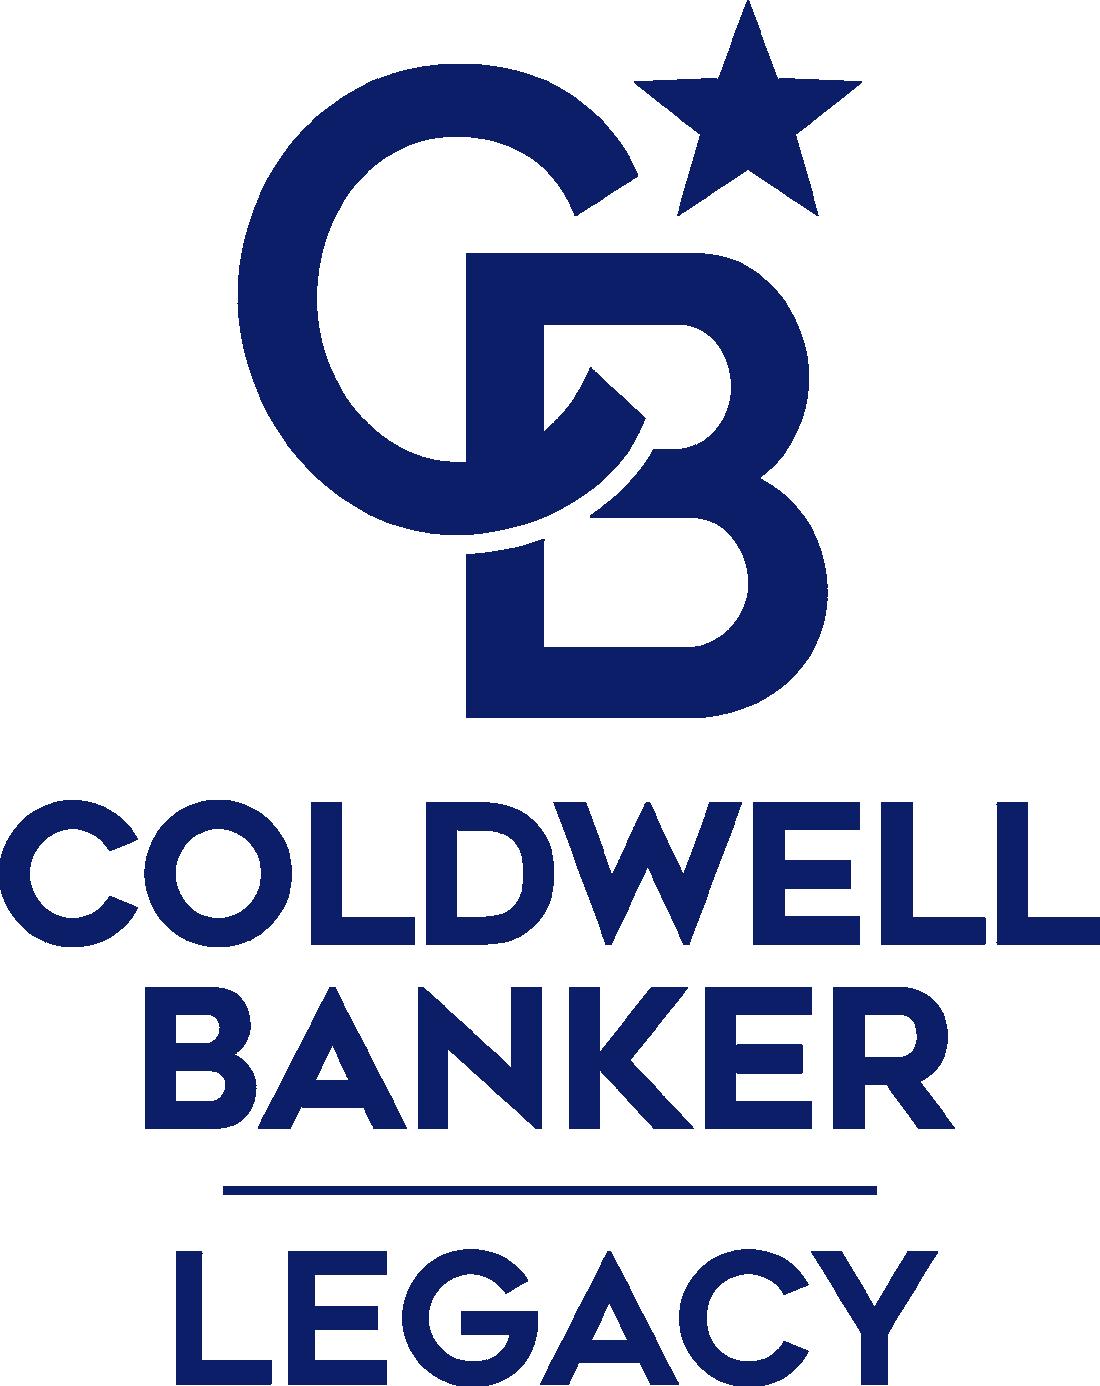 Roy Zesch - Coldwell Banker Legacy REALTORS® Logo